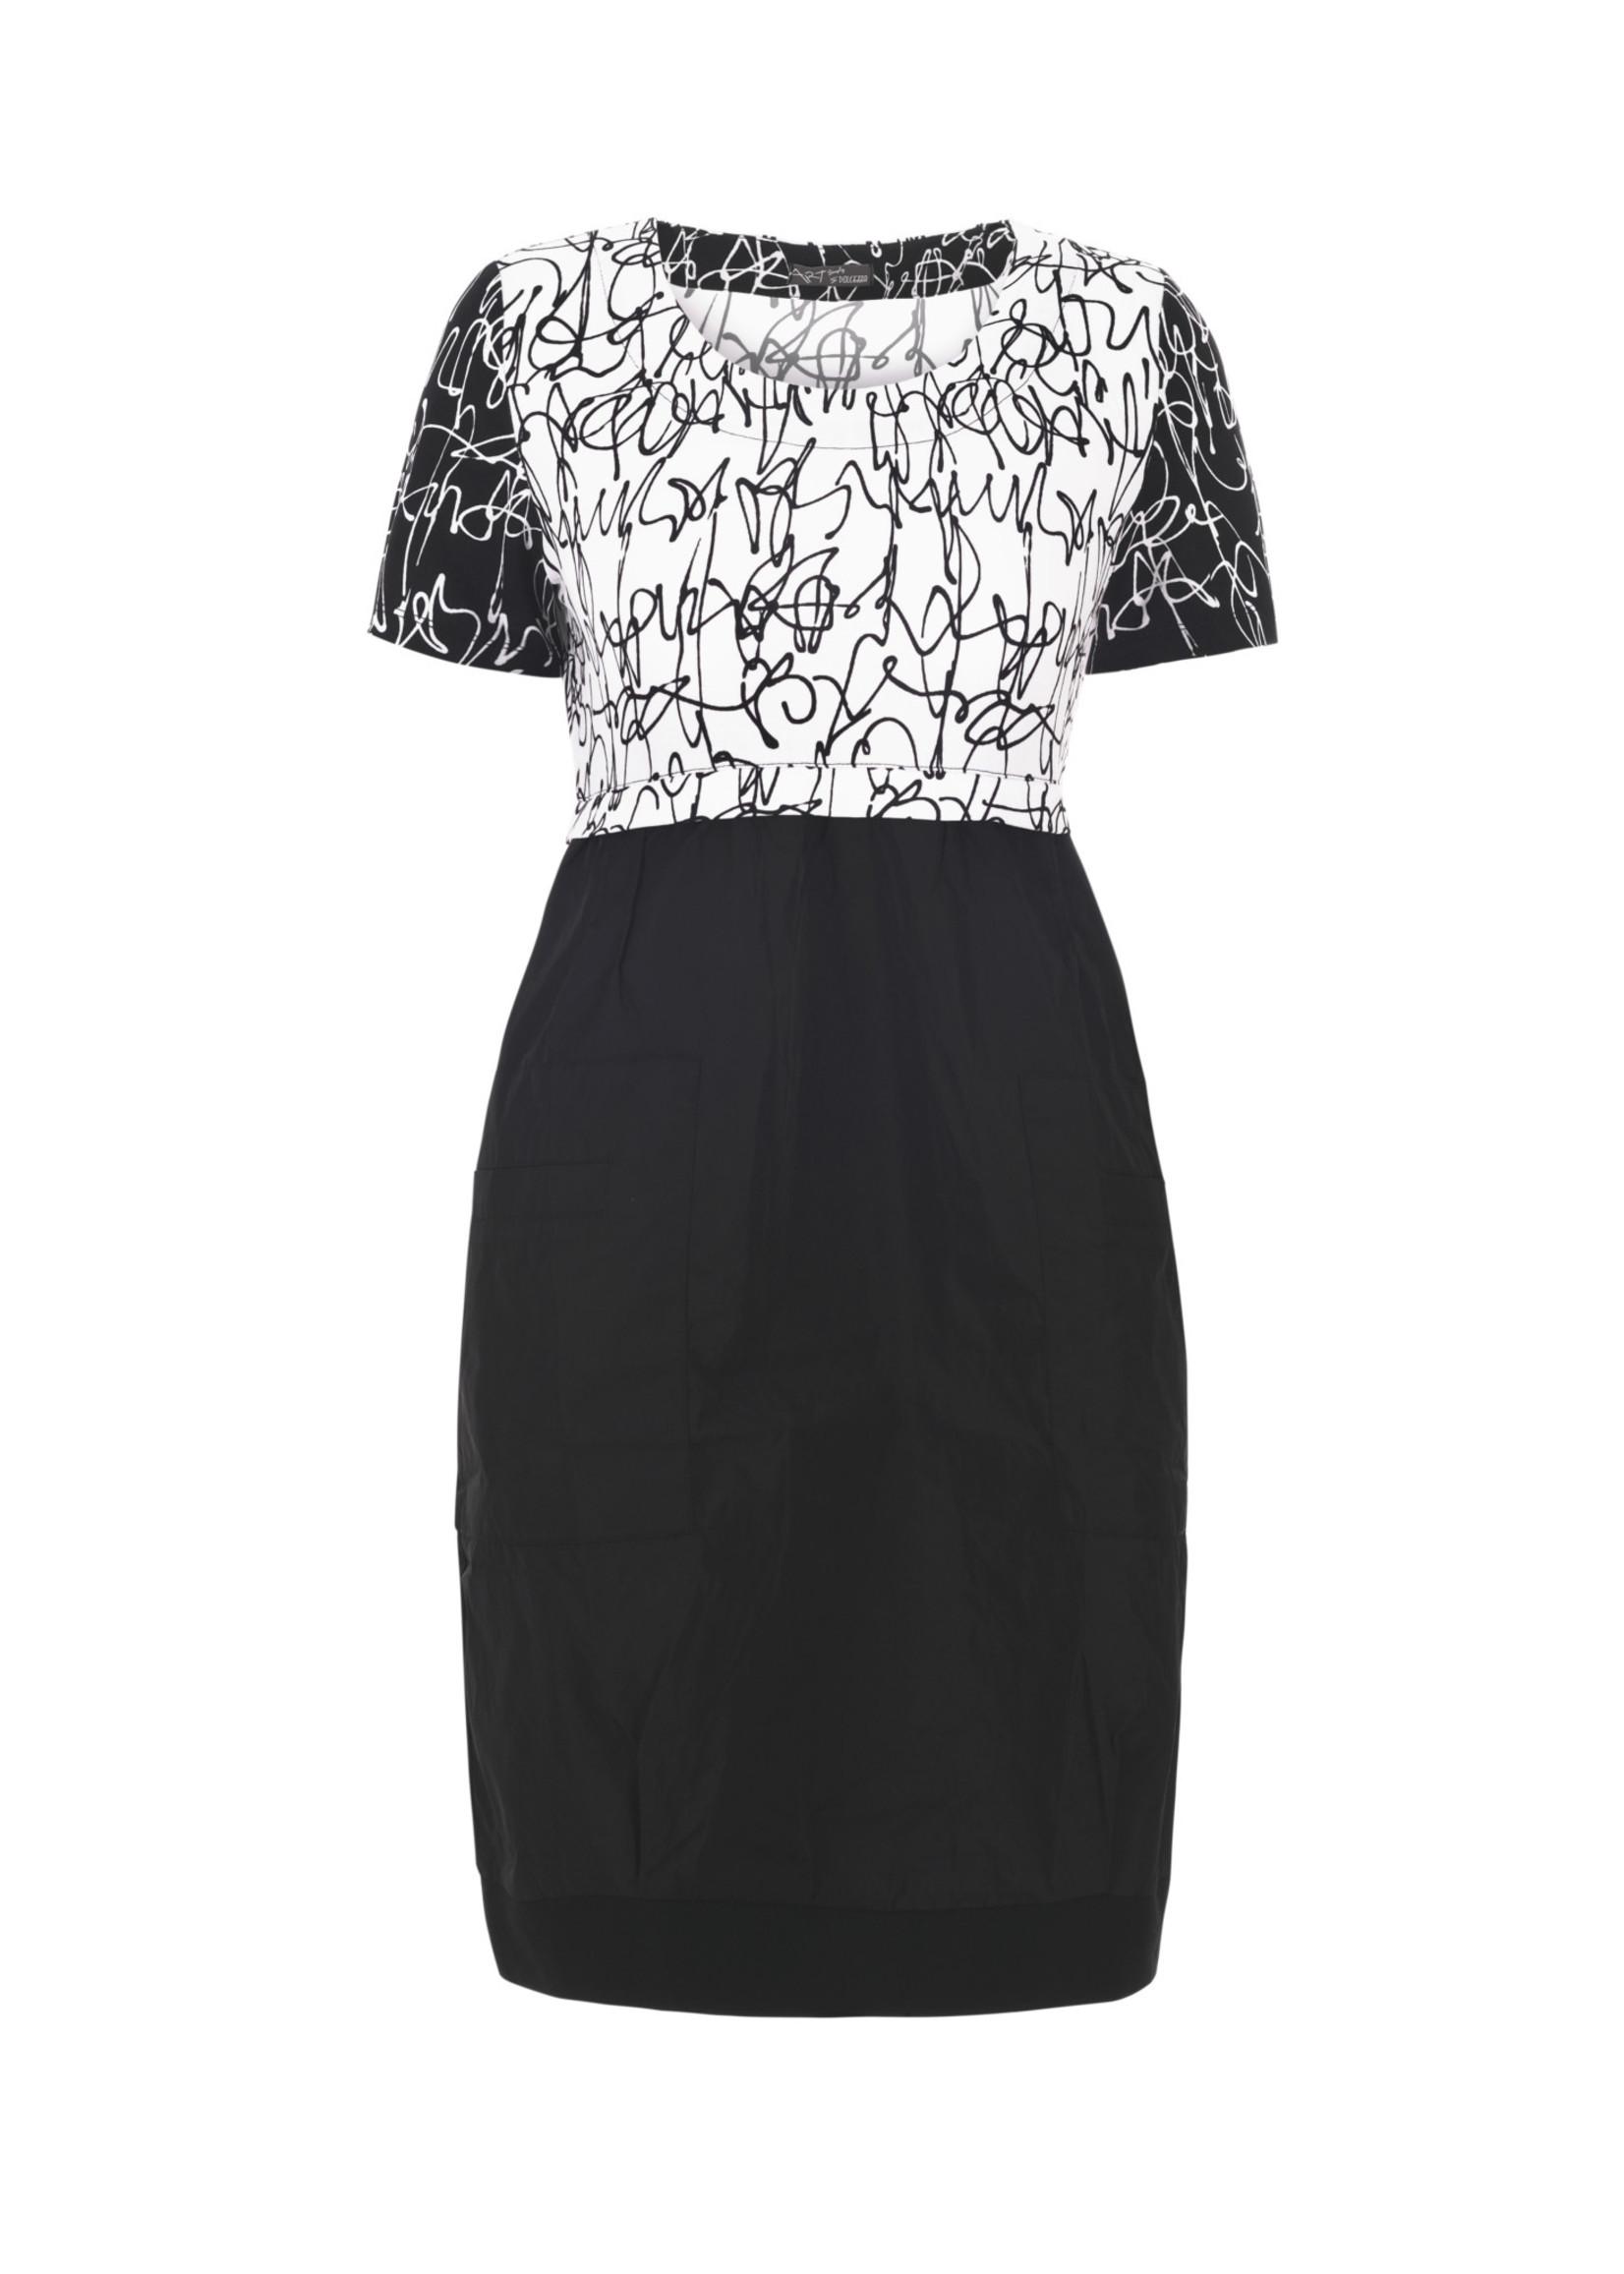 Dolcezza Black & White Knit Dress